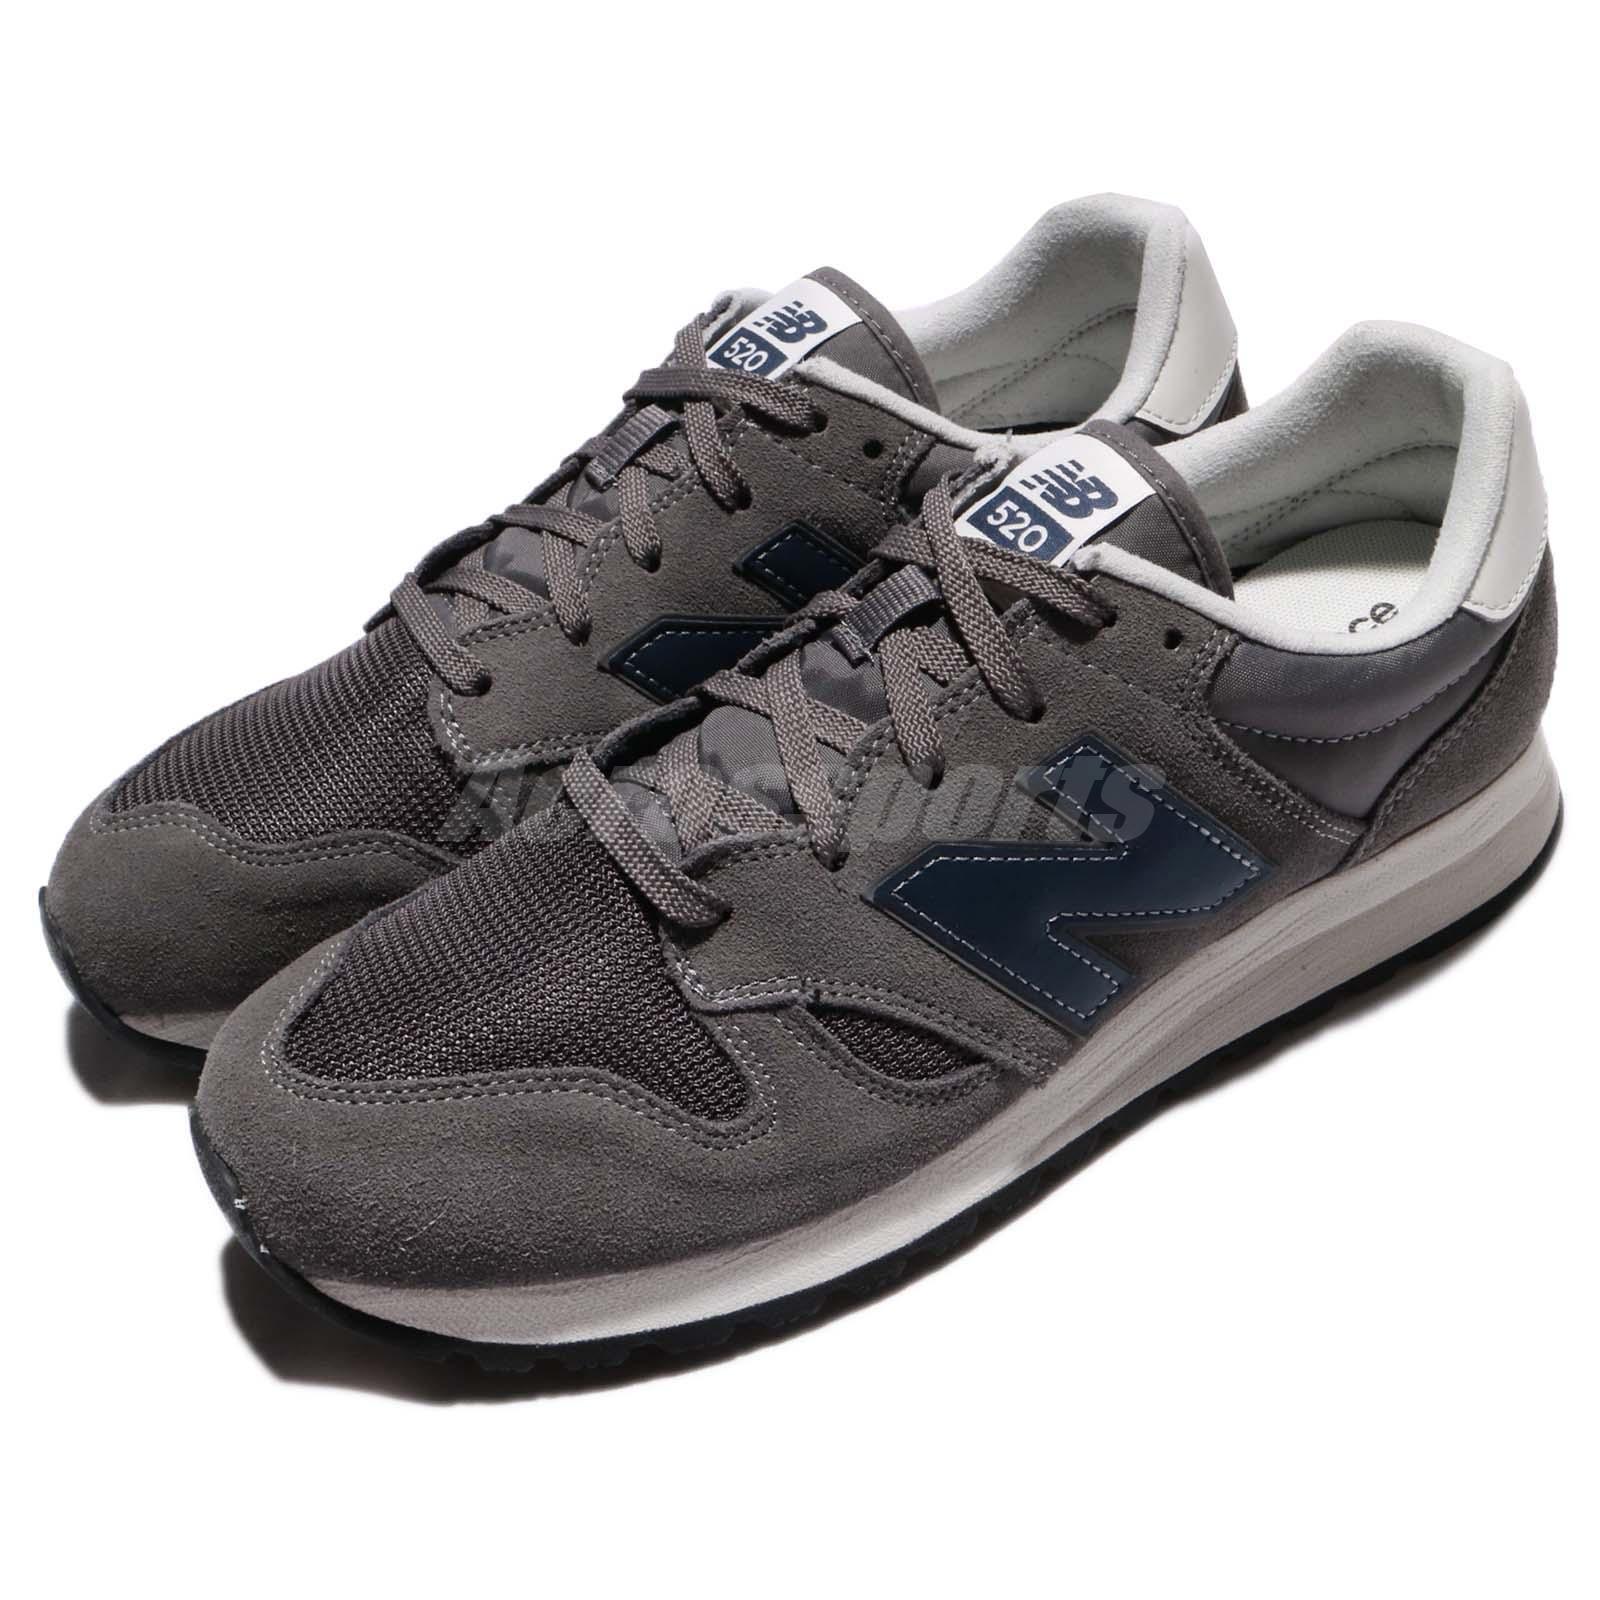 New Balance U520CL D 520 Dark Grigio Uomo Uomo Uomo Running Shoes Scarpe da Ginnastica Trainers U520CLD 6bf675